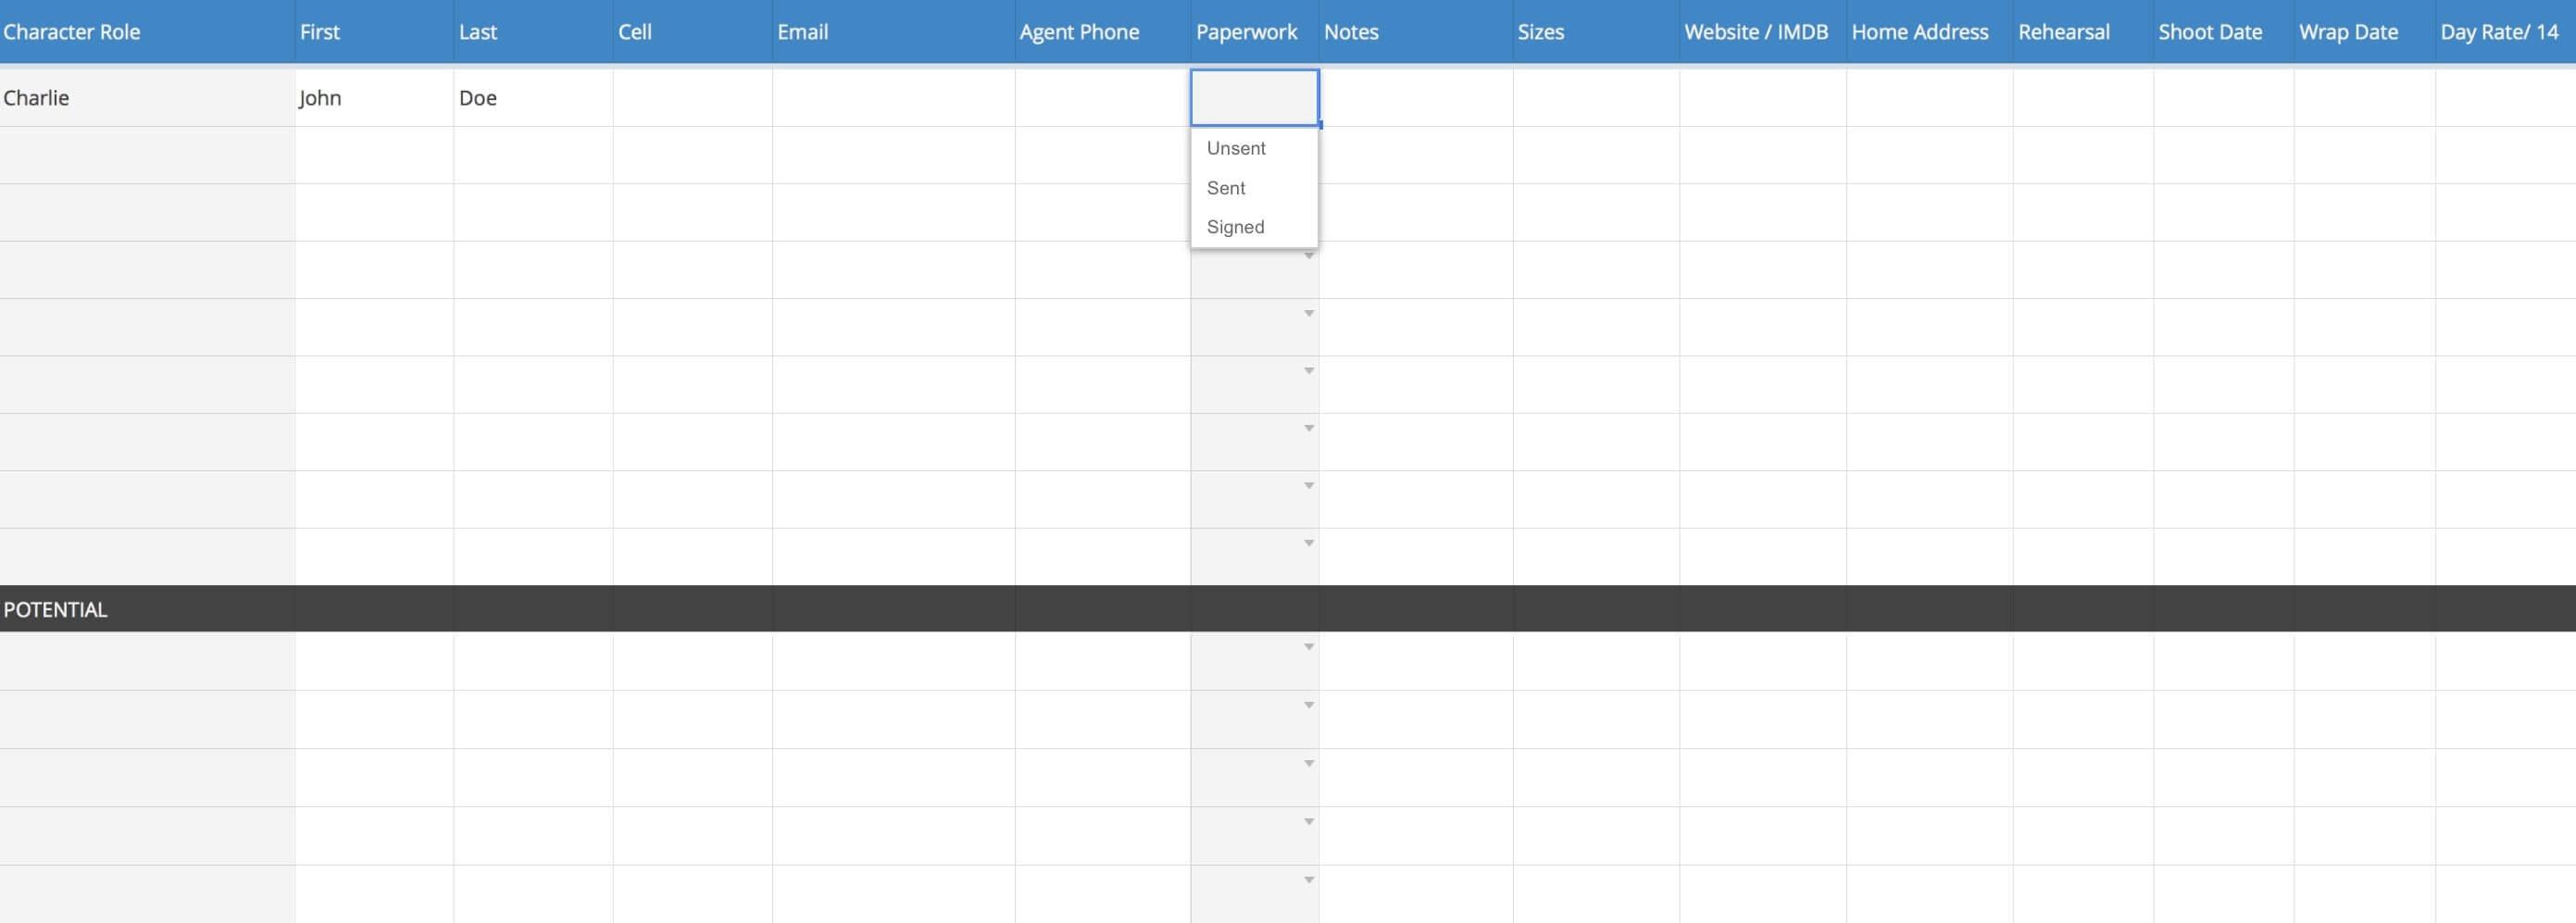 Cast List Template - StudioBinder